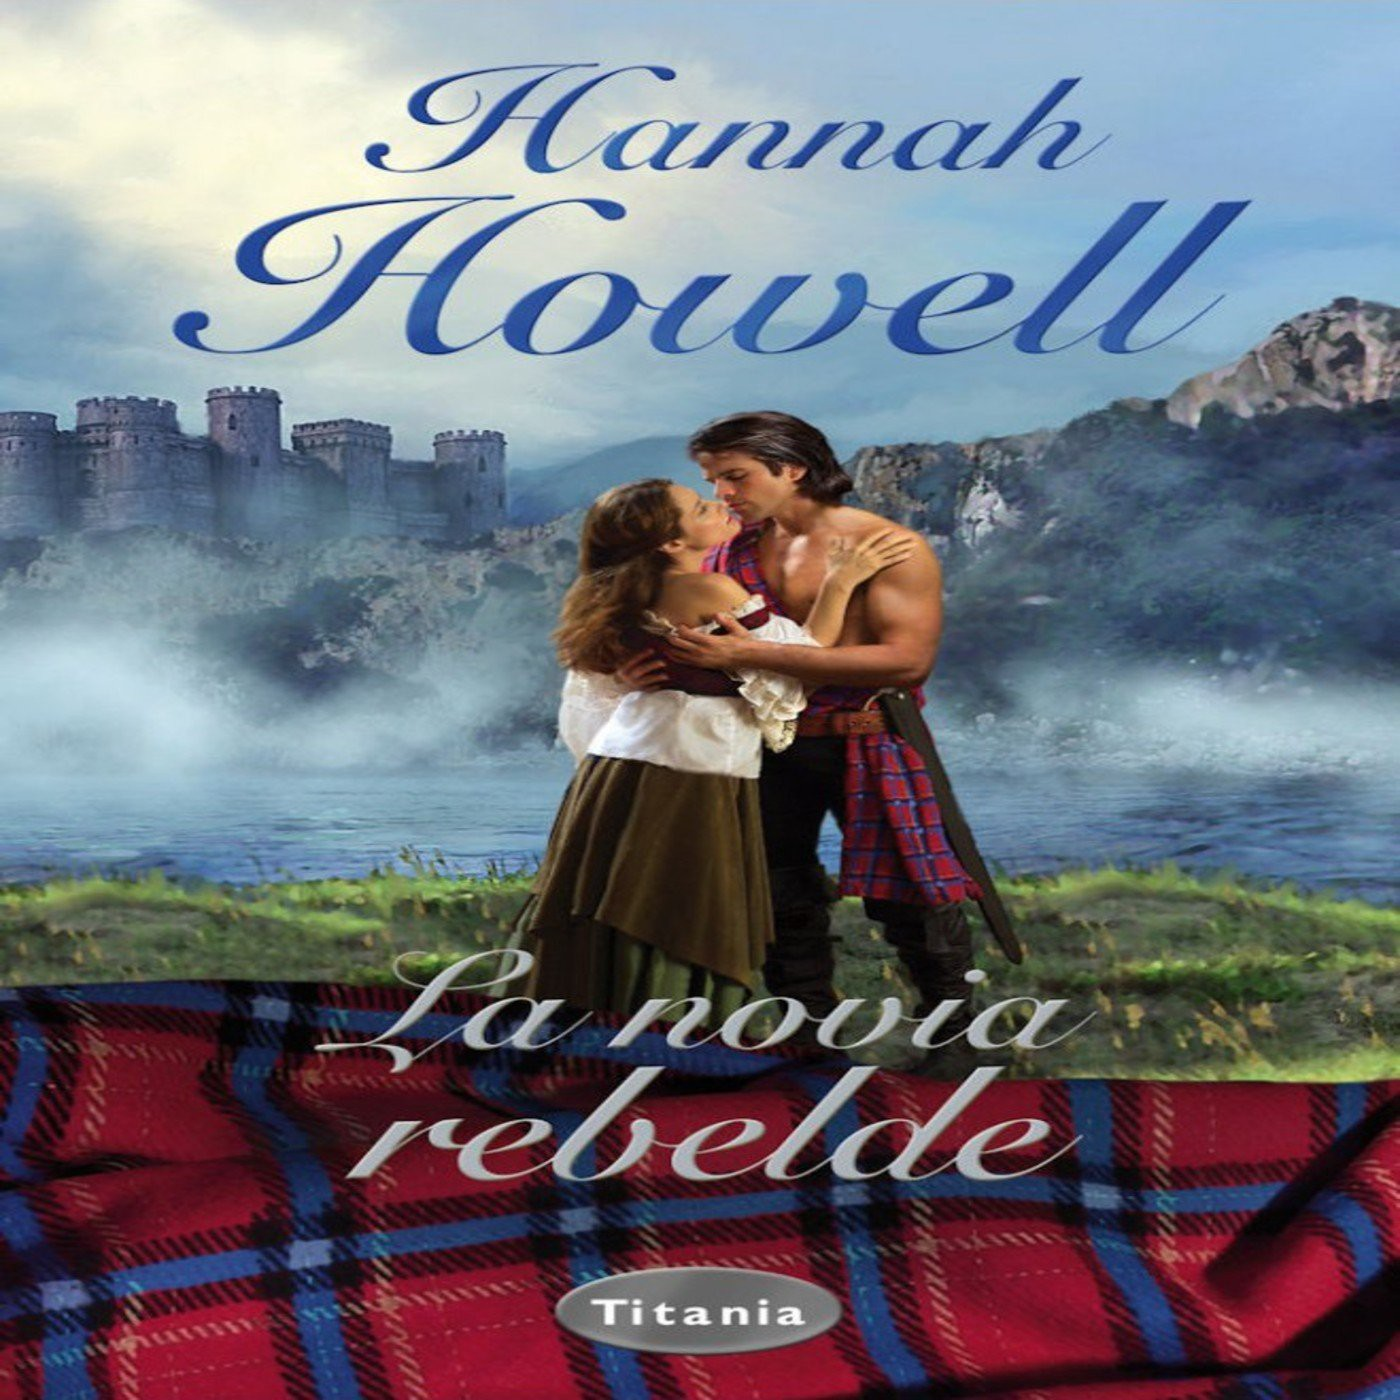 La Novia Rebelde ( Cap 1 al 4 ) en Highland Brides 1 de Howell Hannah en  mp3(15/06 a las 19:08:28) 01:24:12 4643323 - iVoox